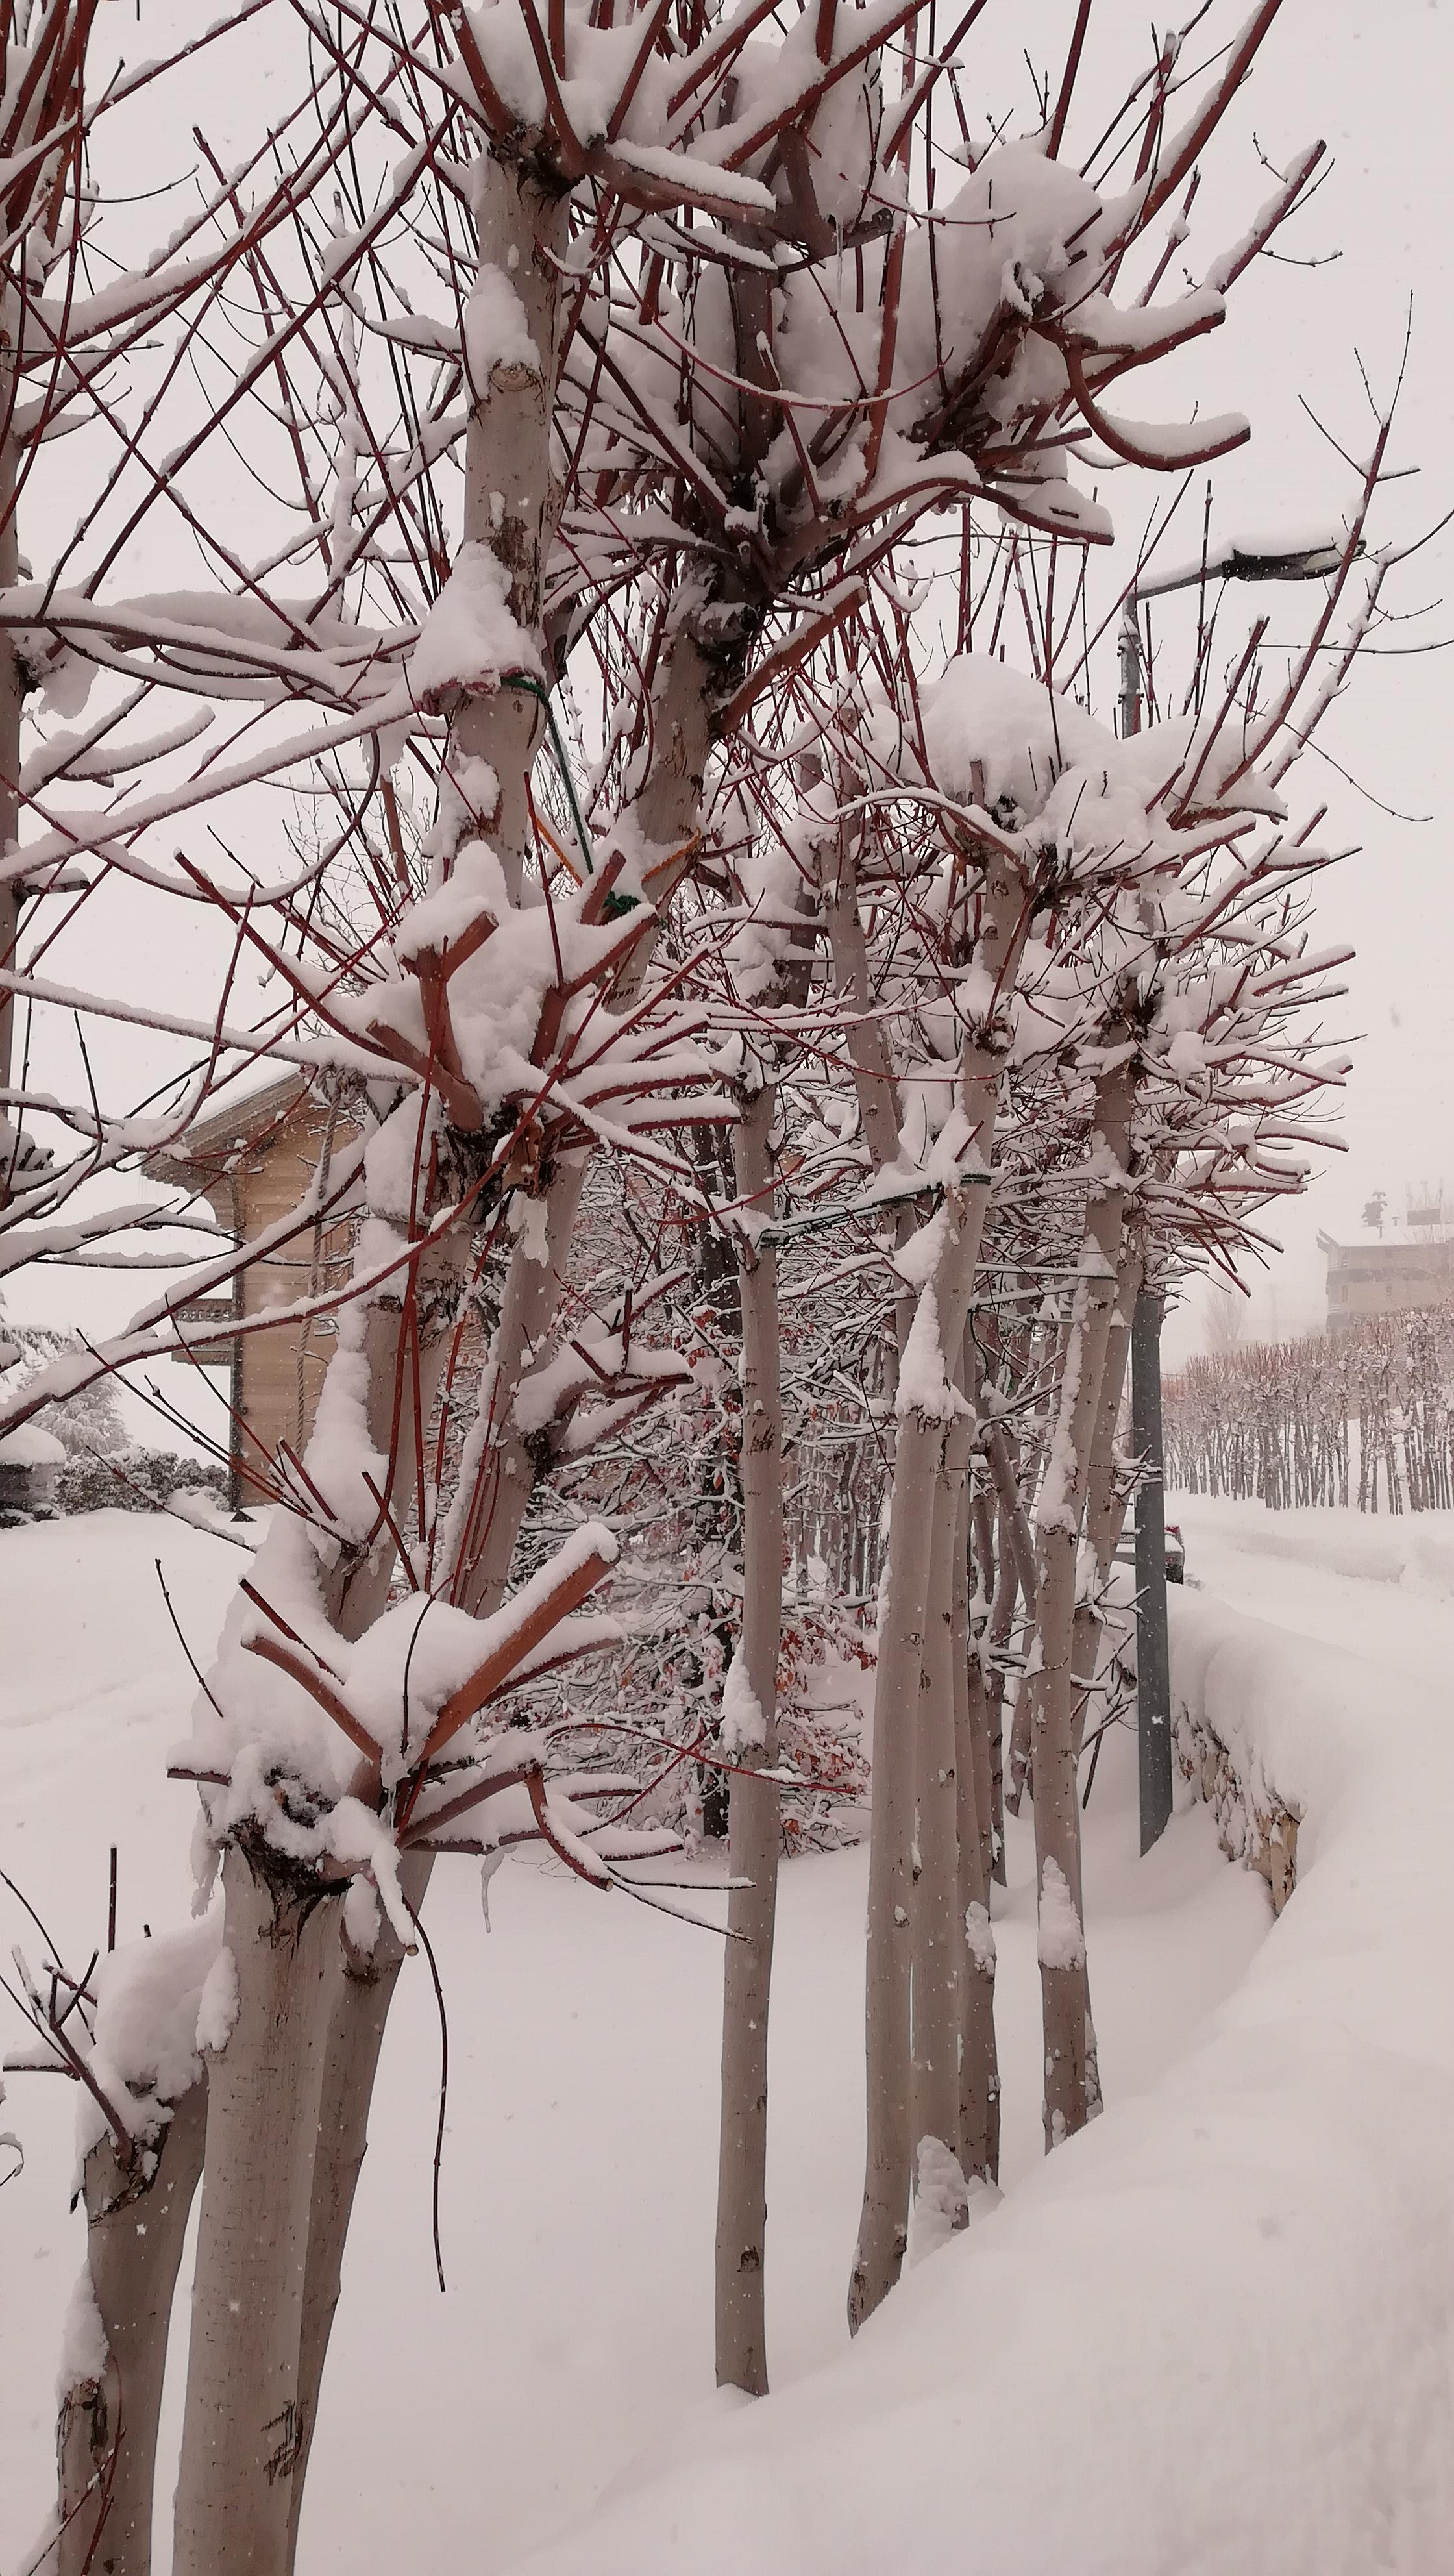 Lovely, Mzaar Ski Resort